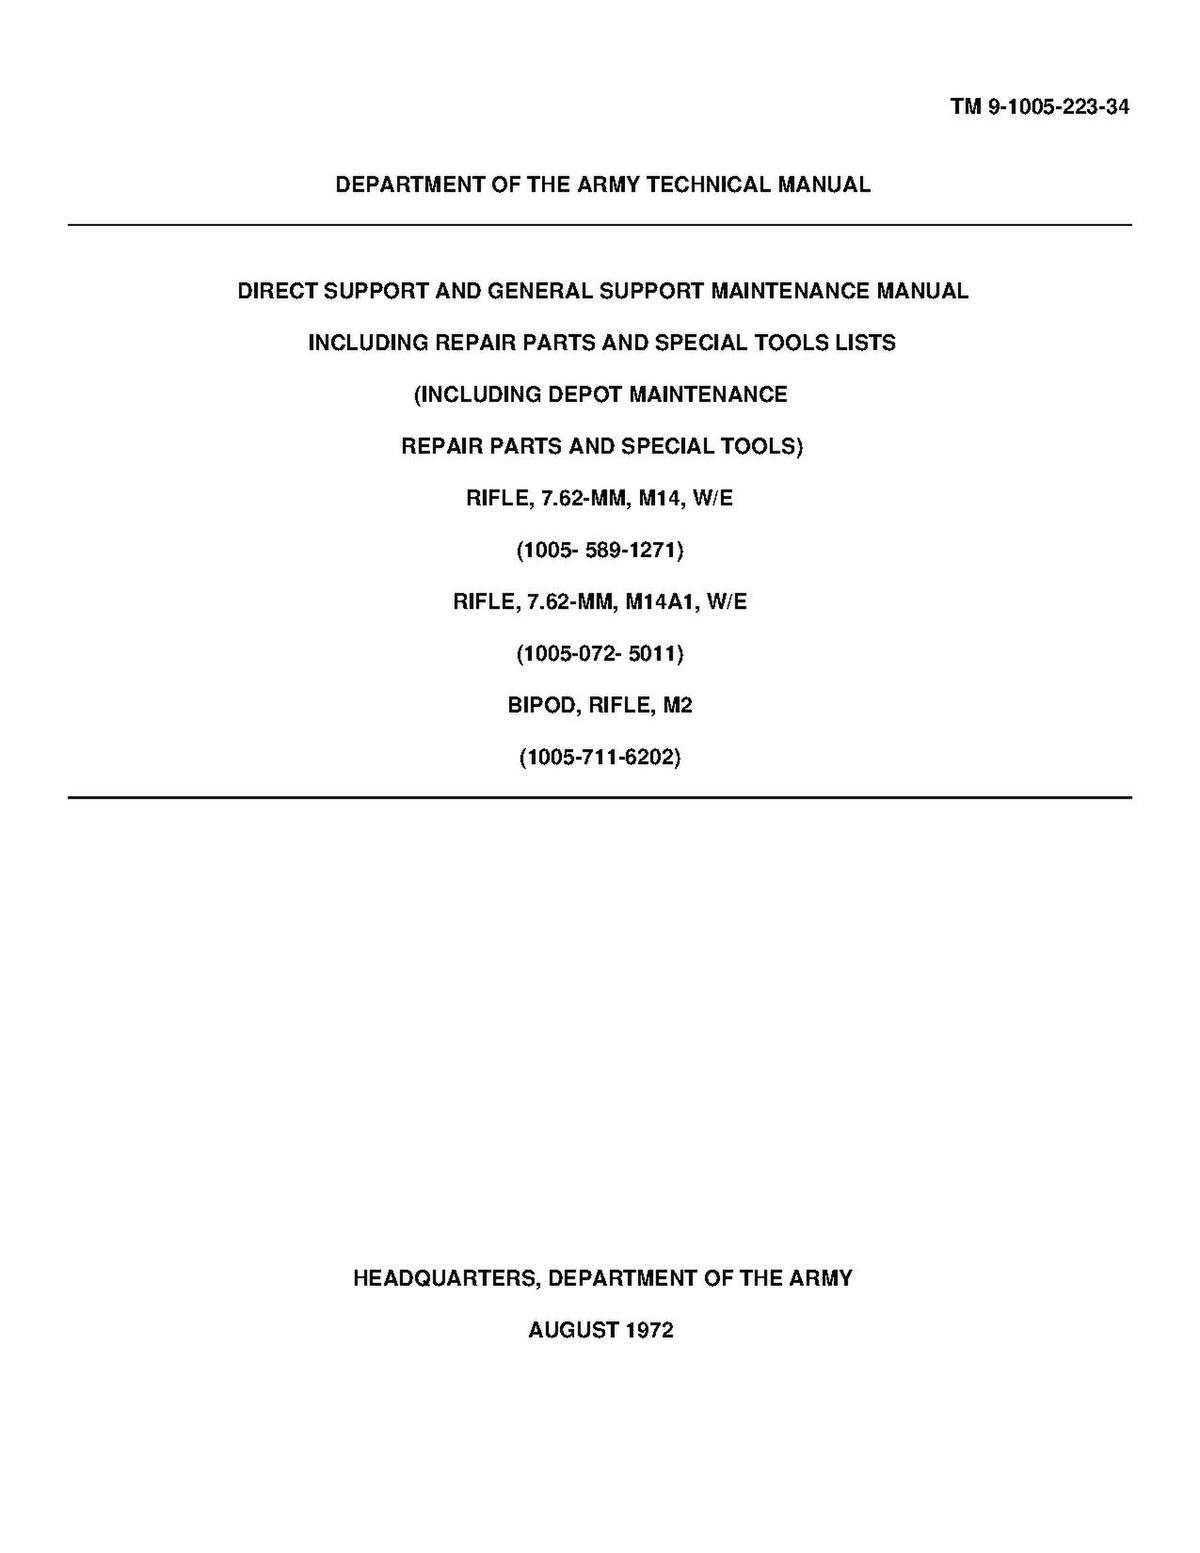 File:TM-9-1005-223-34.pdf - Wikimedia Commons